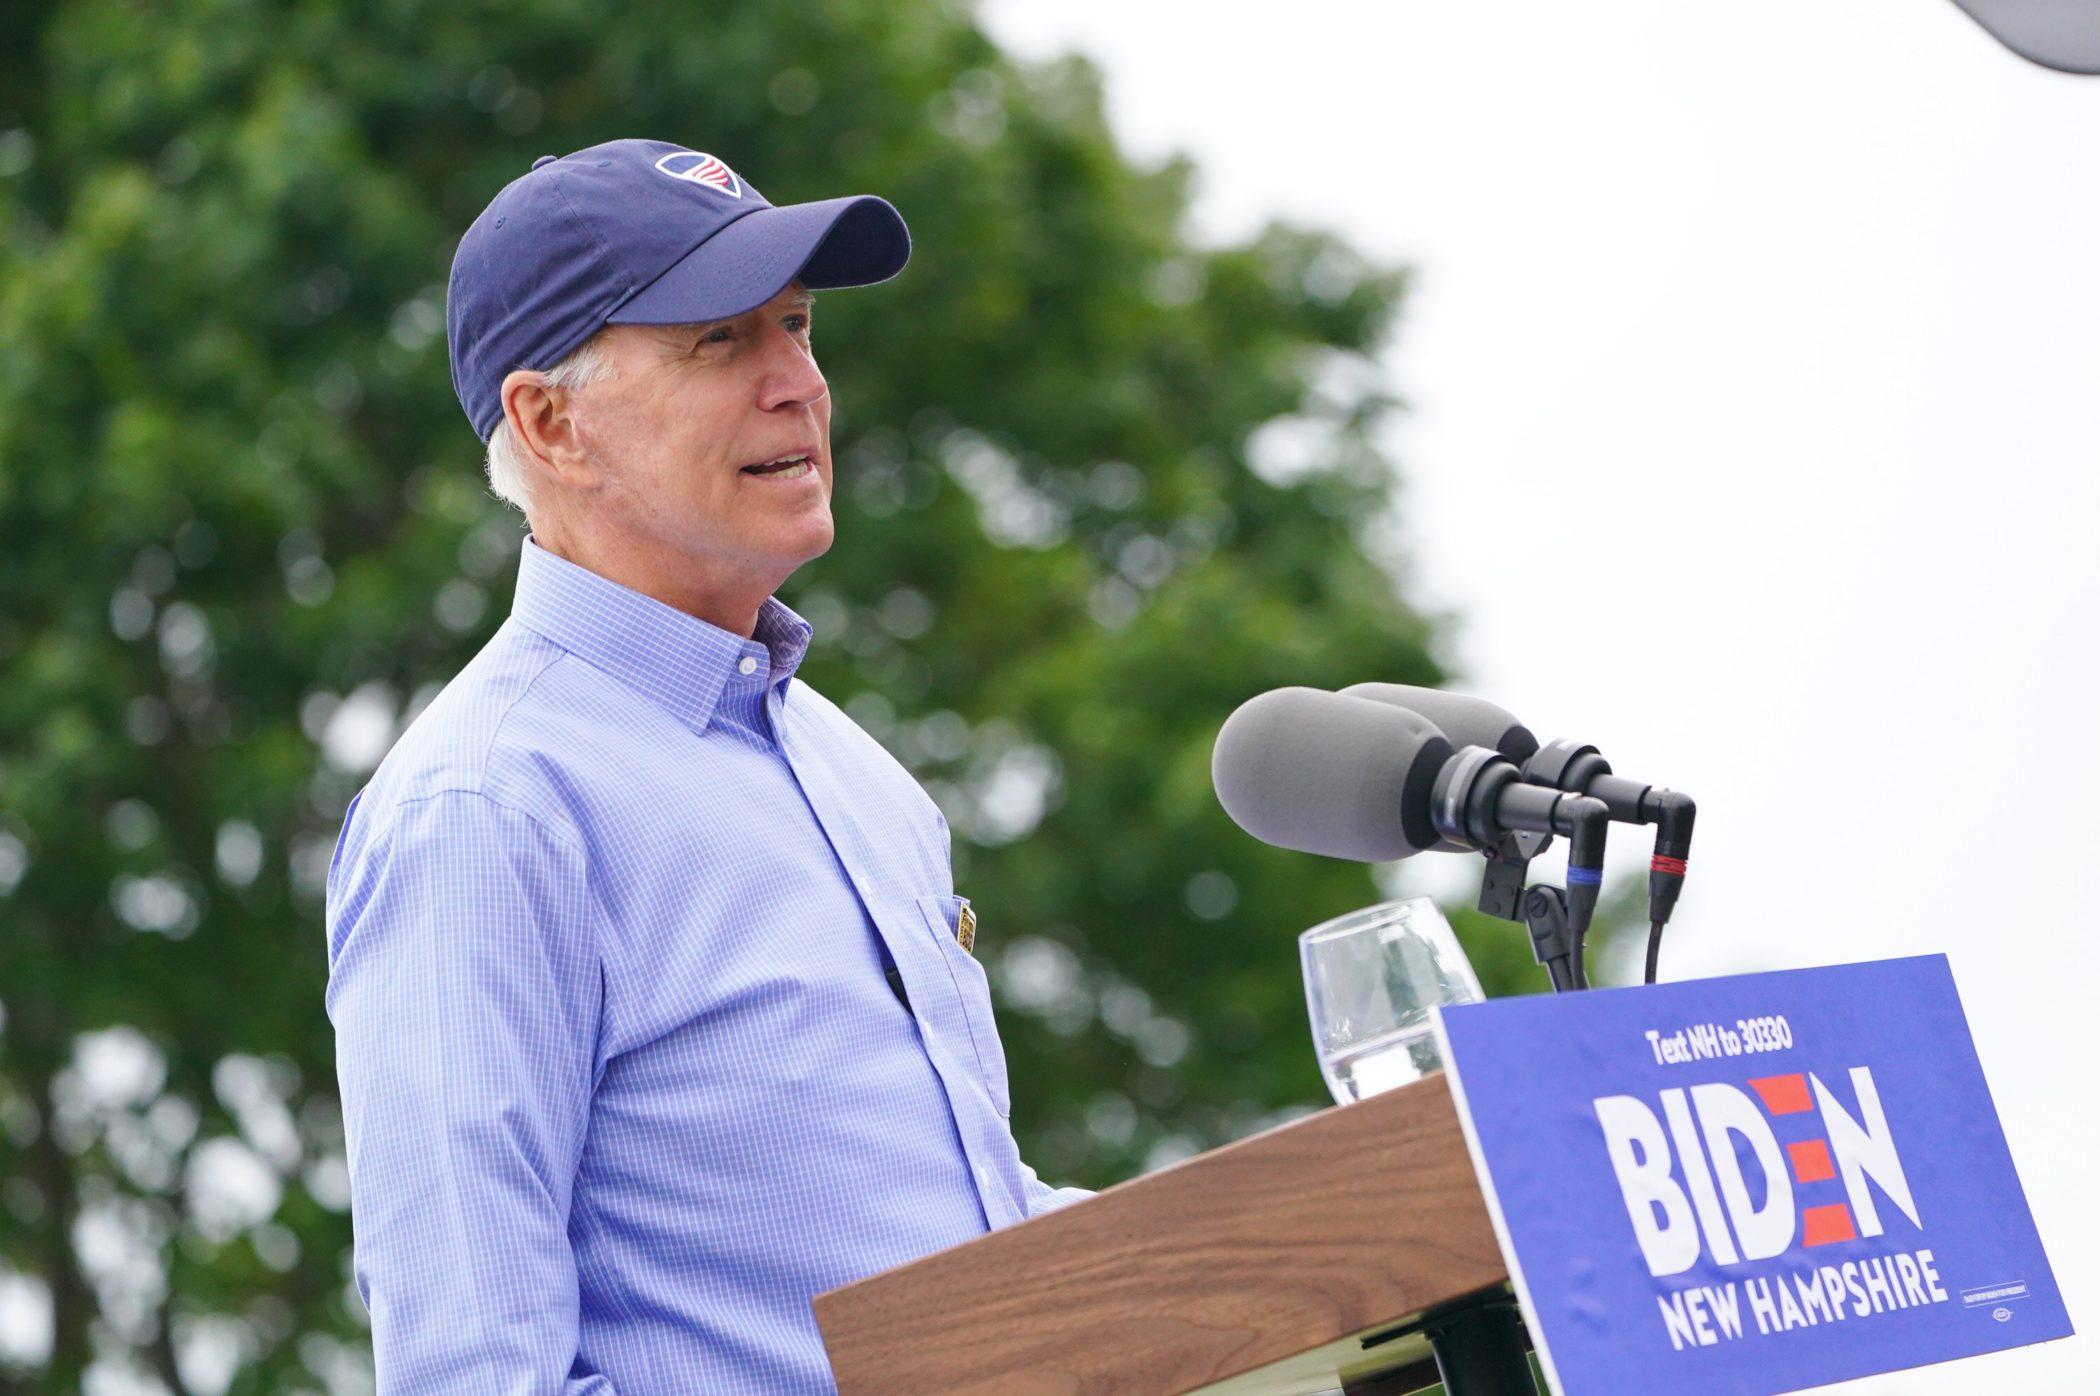 Warren narrows gap with Biden in NBC/Wall Street Journal poll